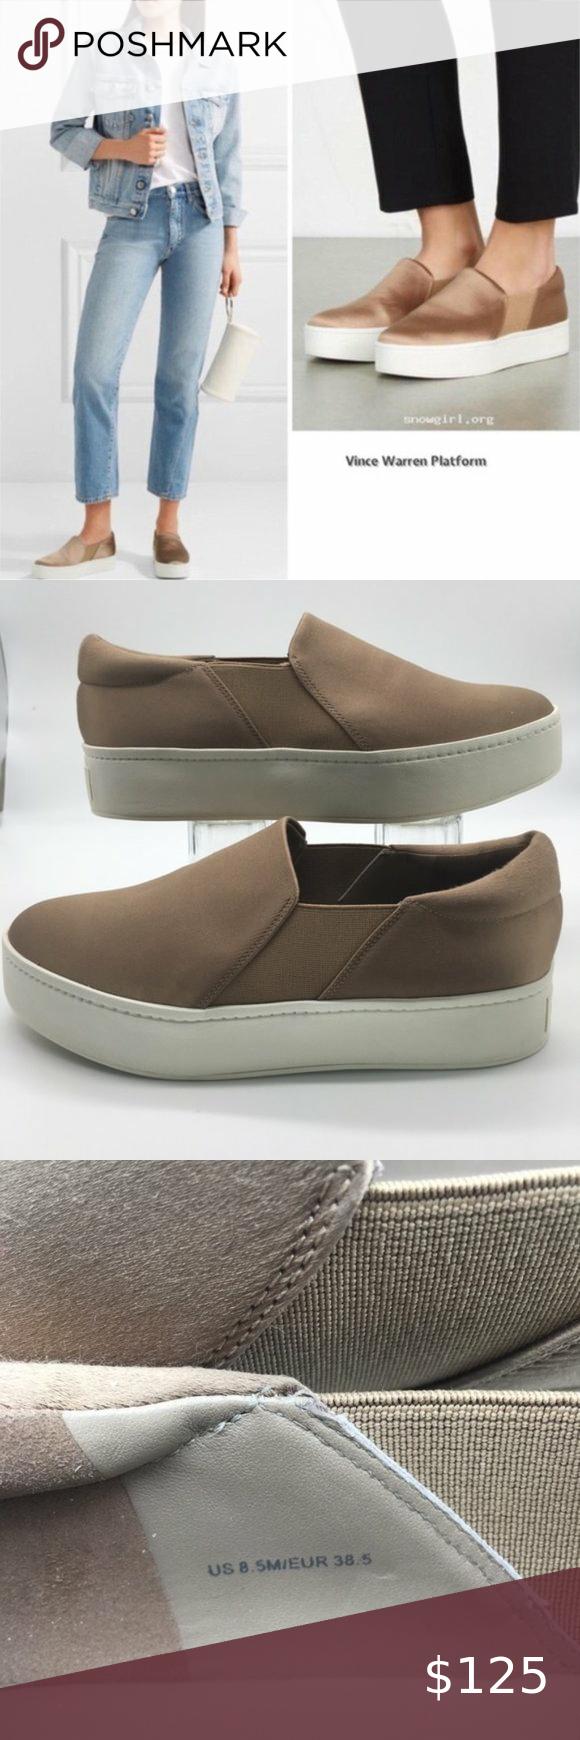 Vince WARREN Fawn Platform Sneaker 8,5